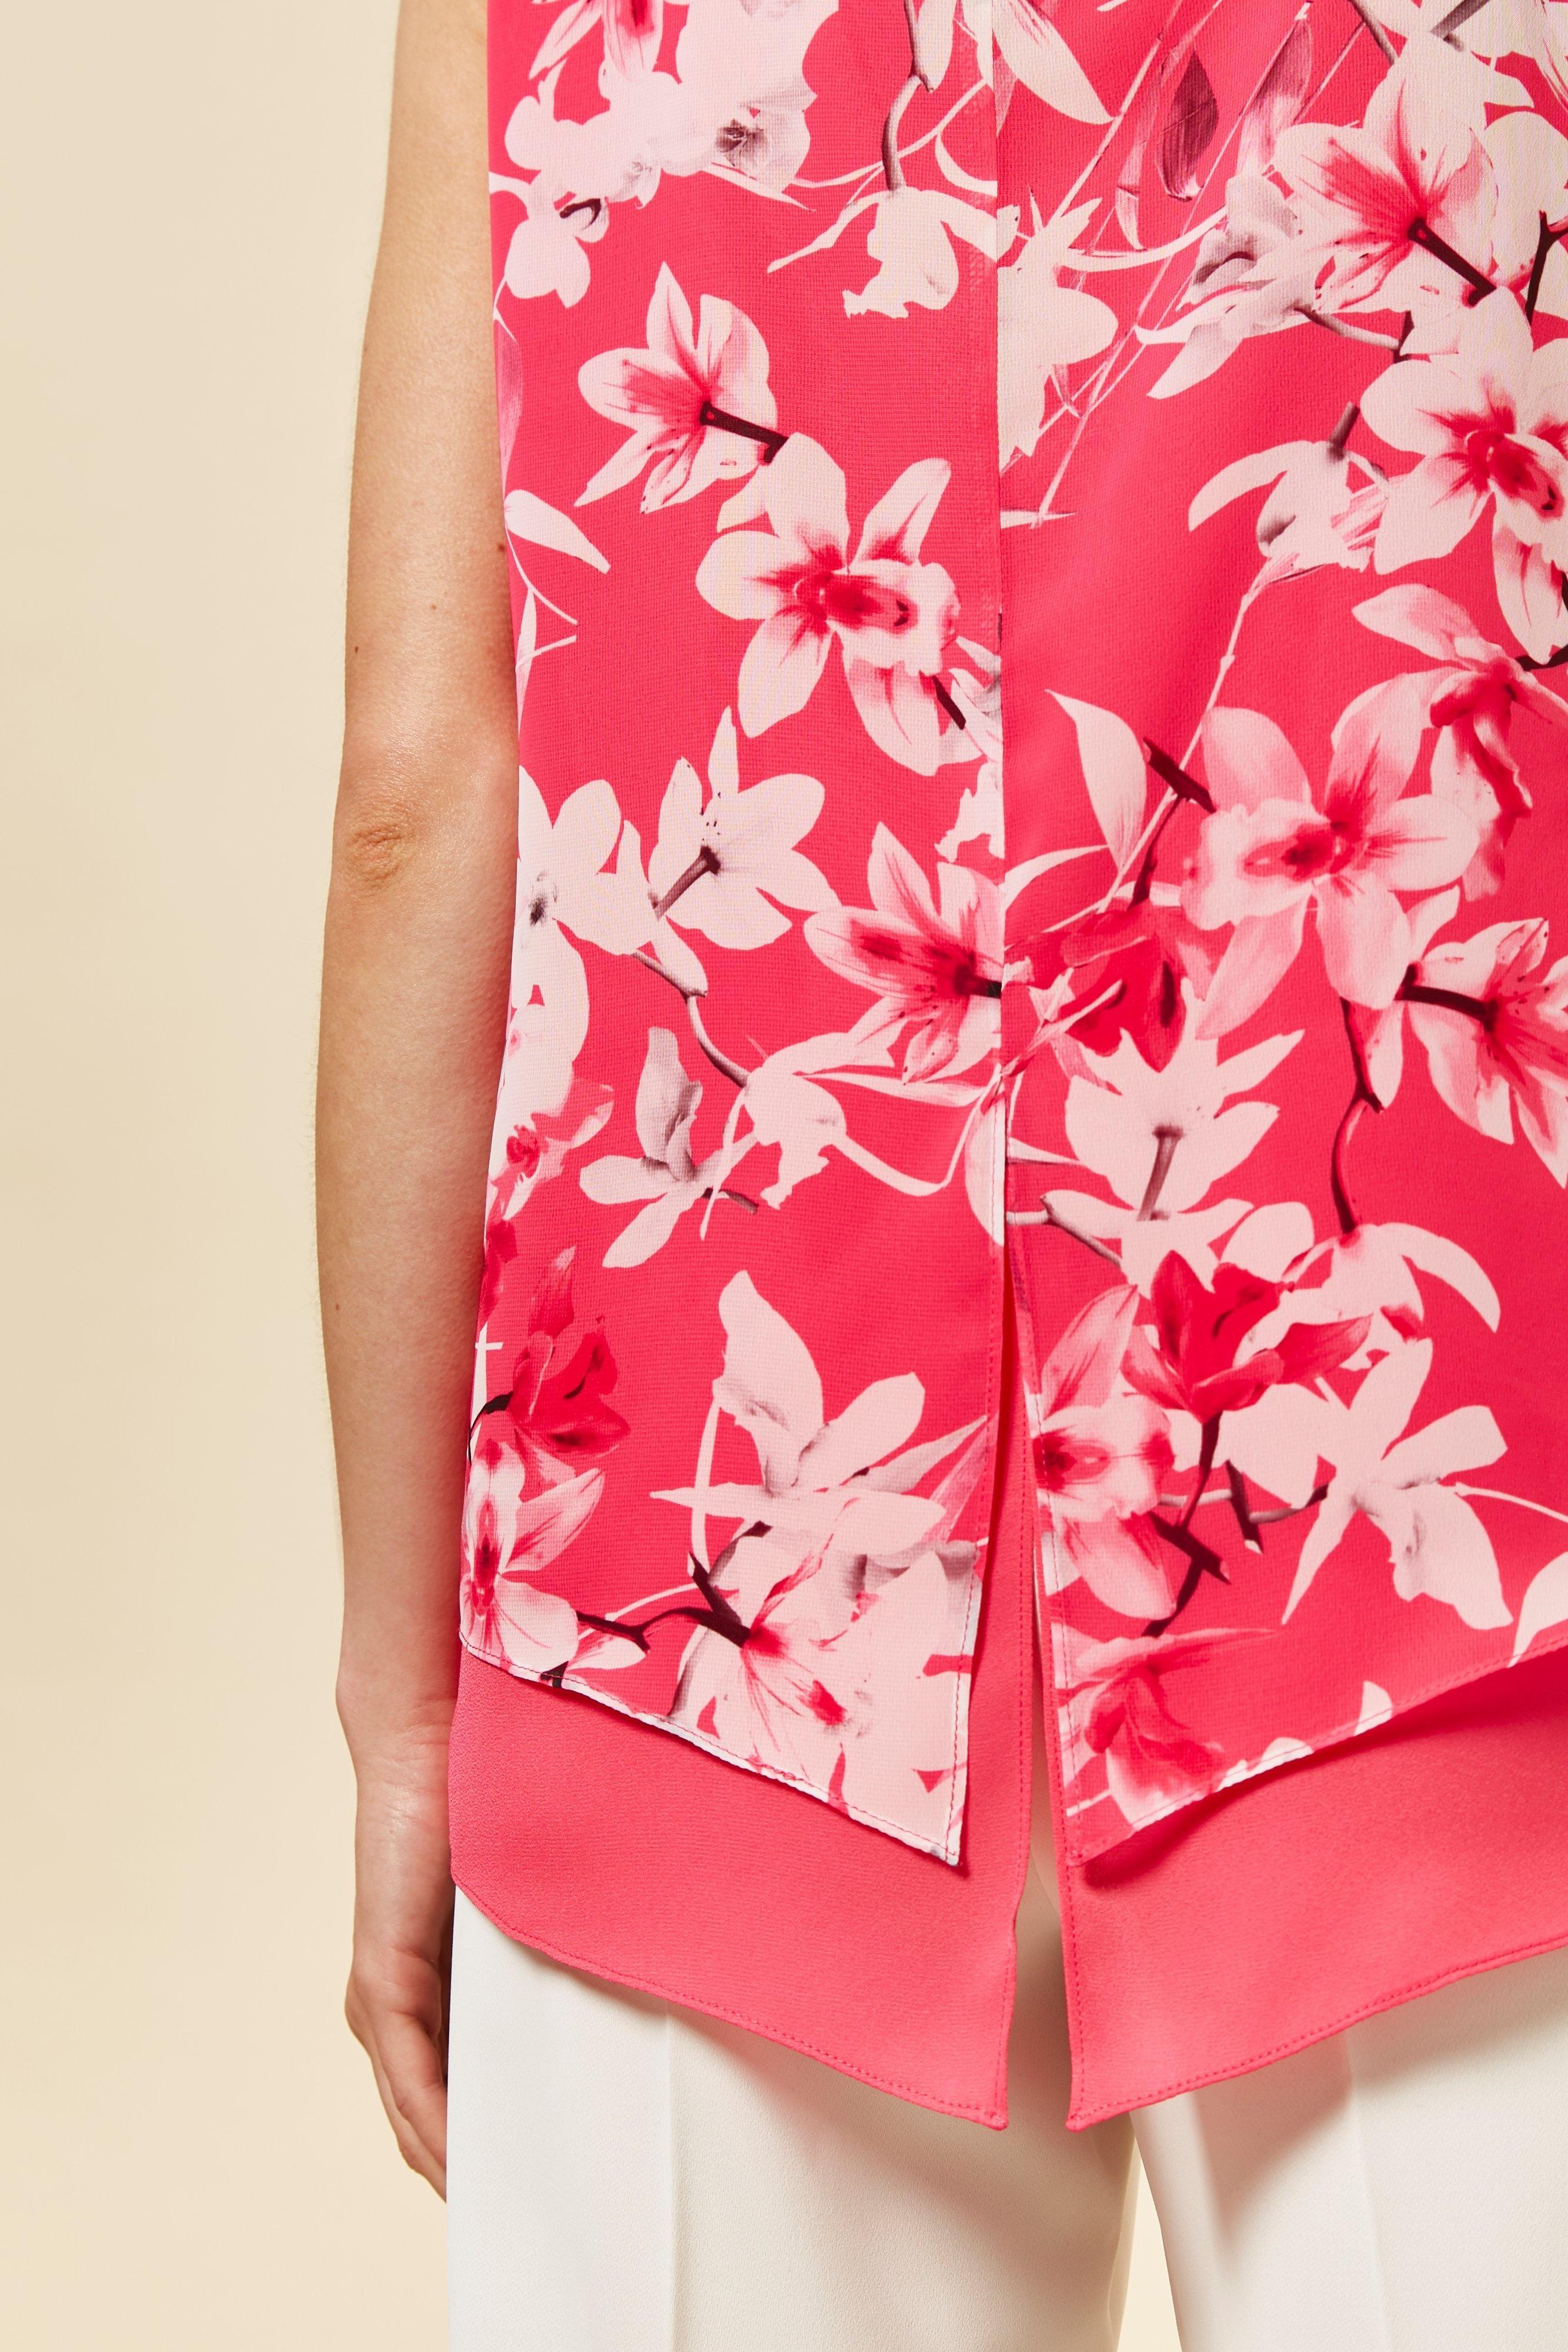 58a2d1783670 Wallis - Petite Pink Orchid Print Overlay Top - Lyst. View fullscreen